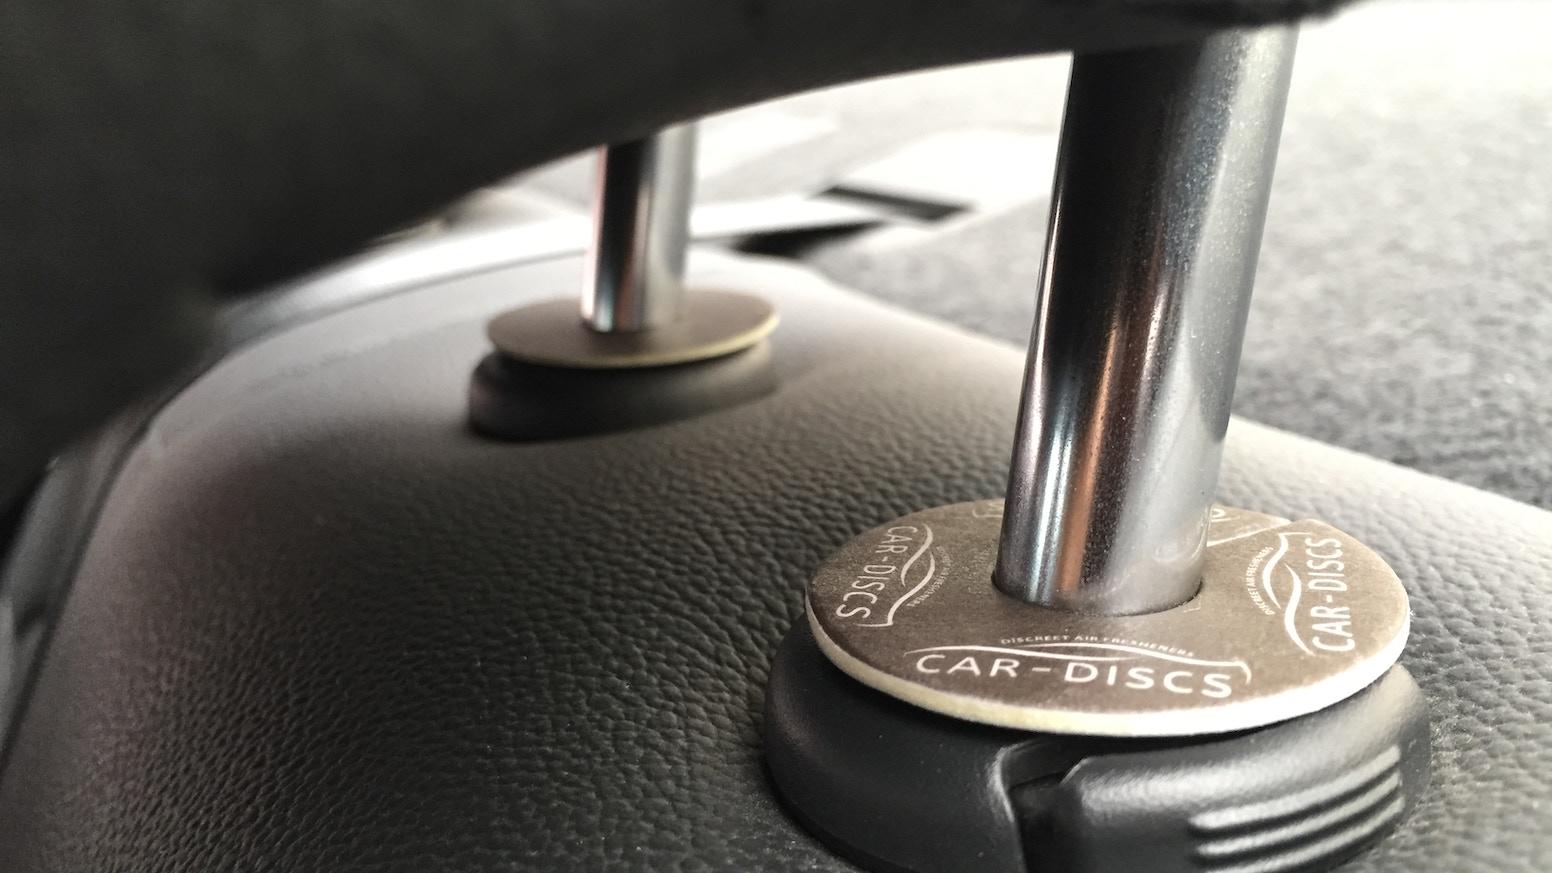 Car-Discs Discreet Air Fresheners By Ian McClung